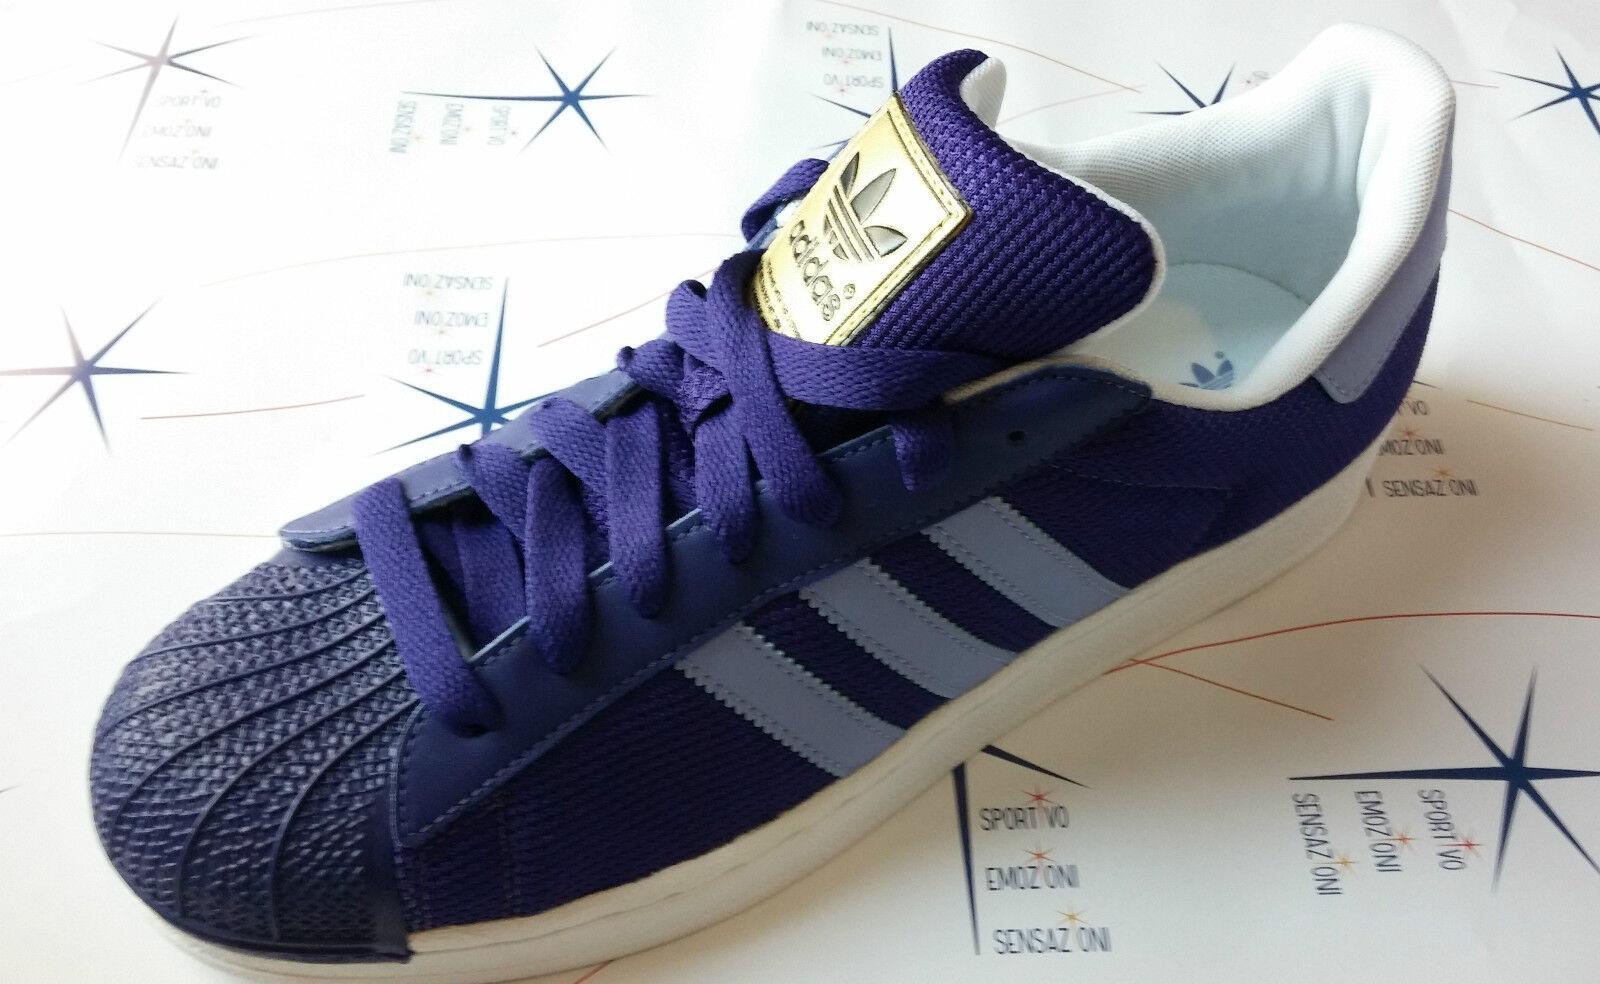 Scarpe Adidas Superstar --  Viola/Lilla -- G16284